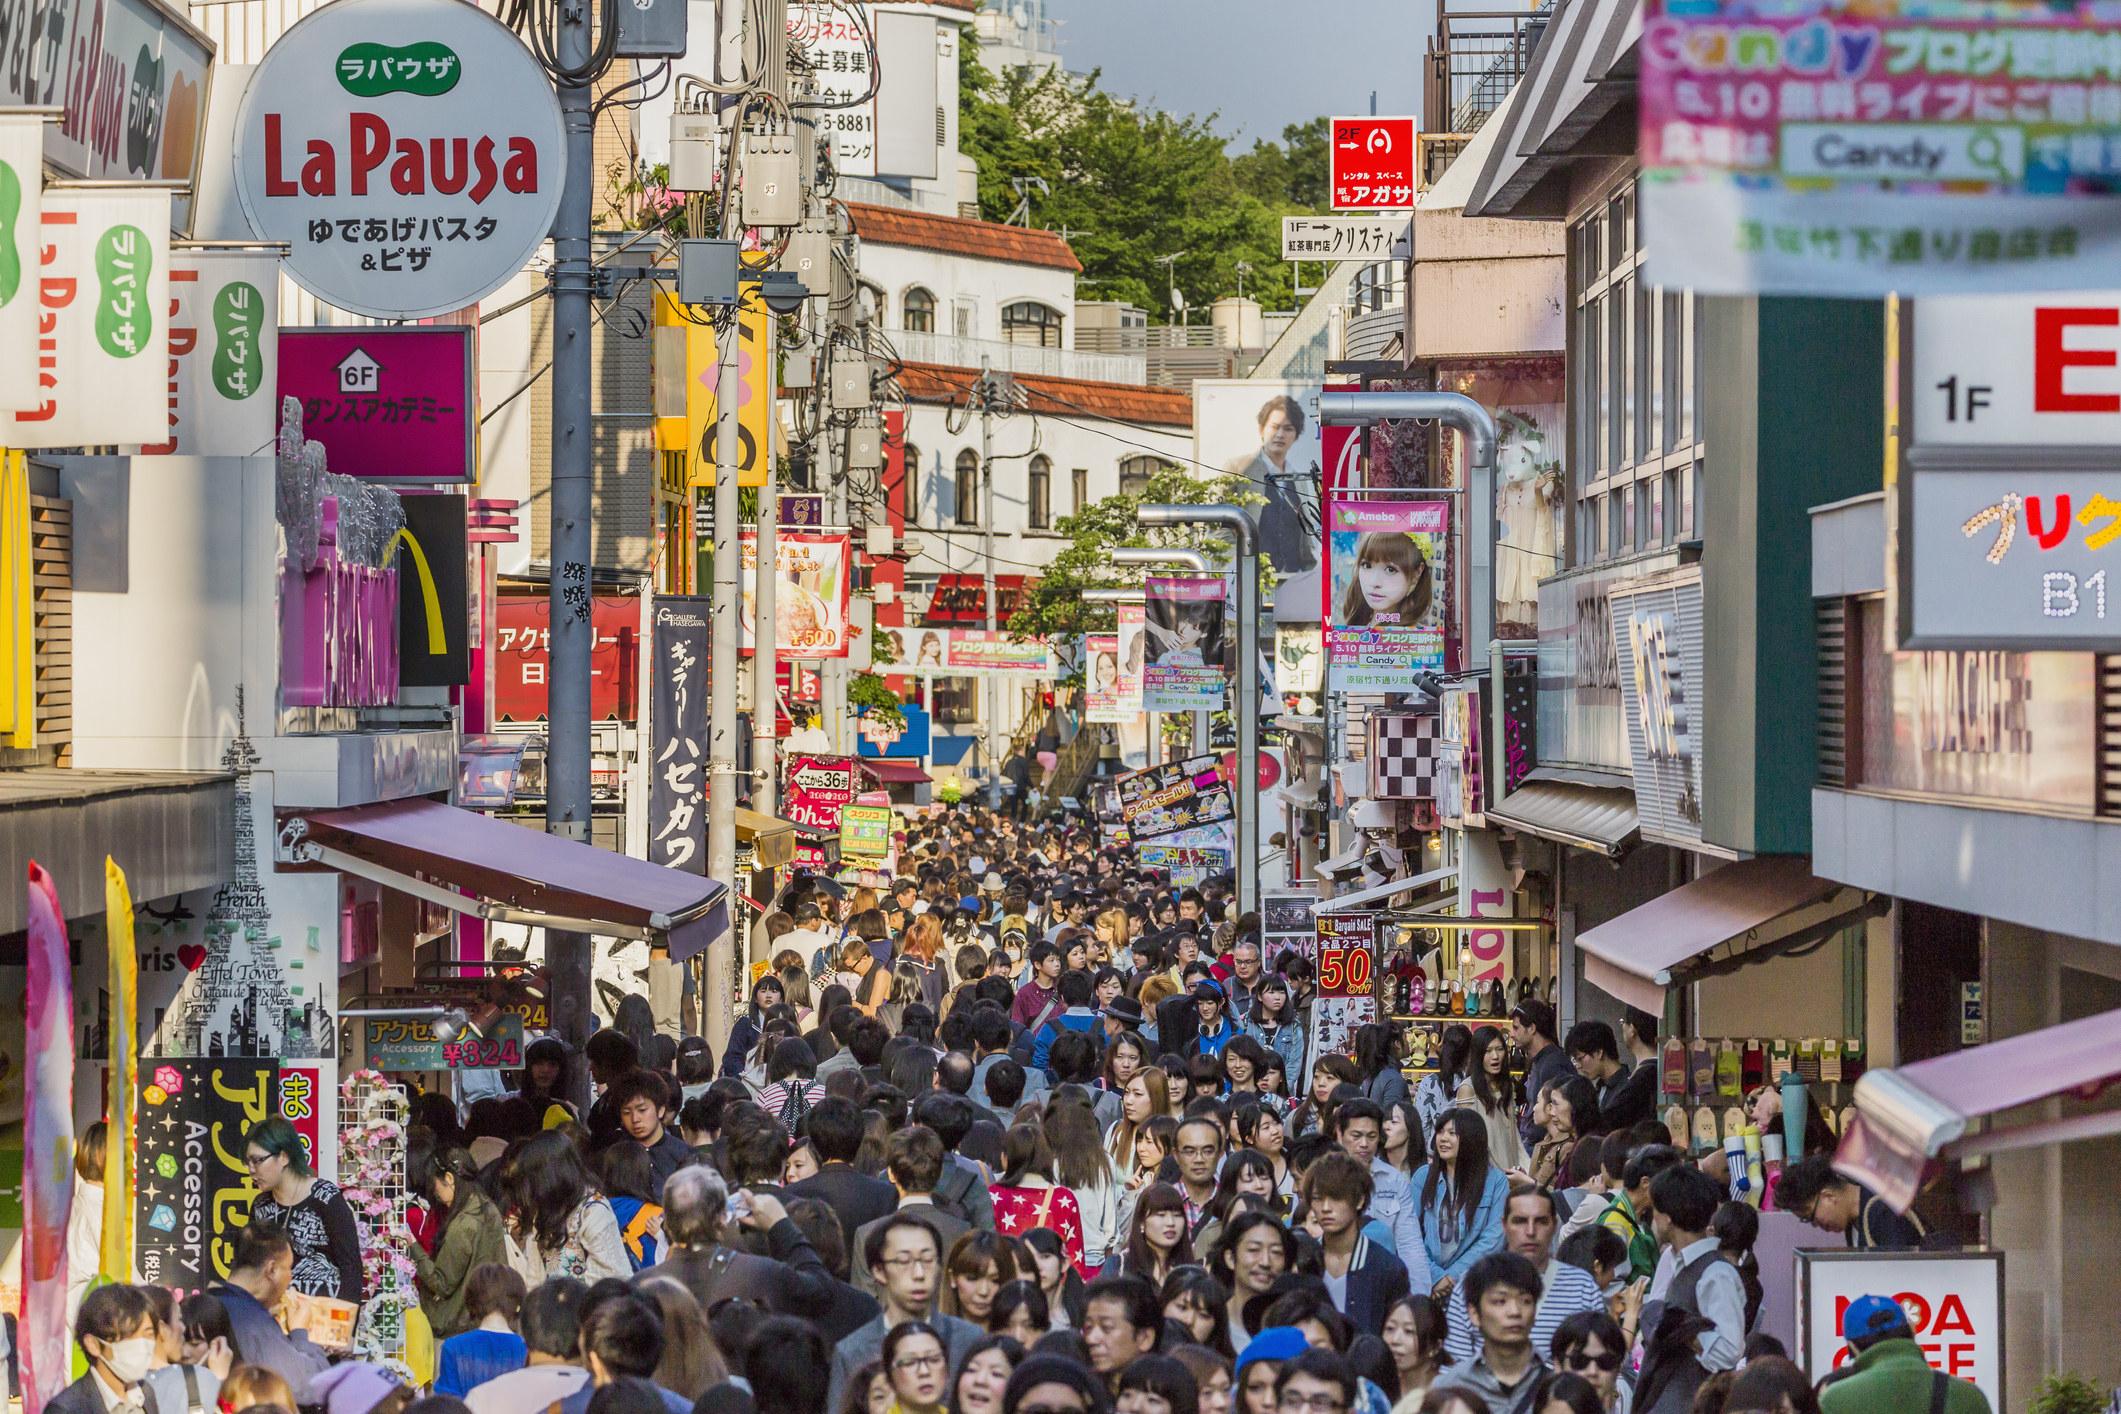 A very busyTakeshita Street in Harajuku.